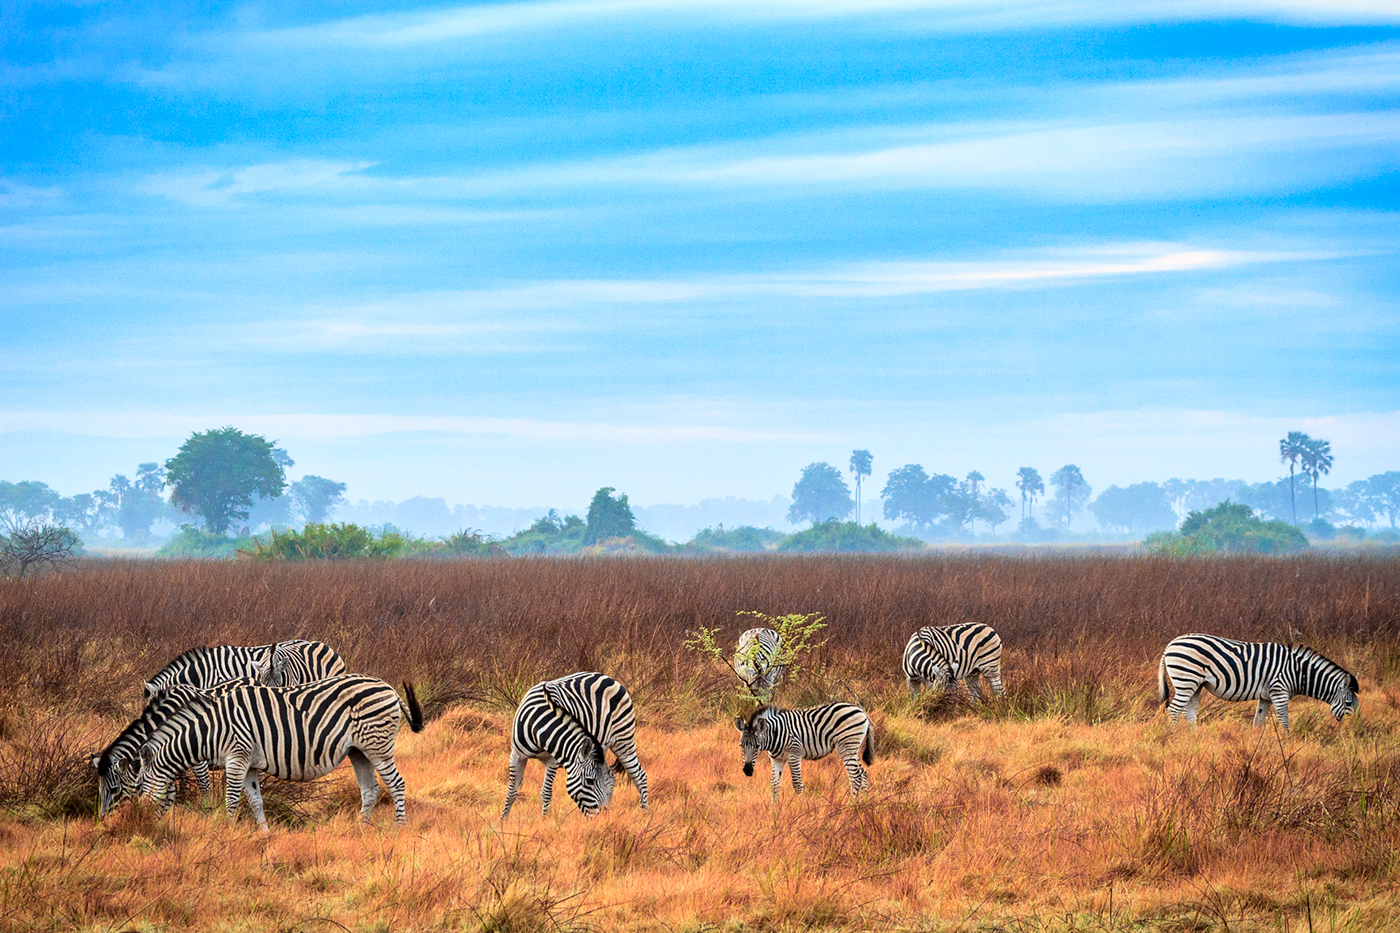 africa Botswana wildlife wilderness Okavango Delta Lions elephants Buffalo leopard hippo